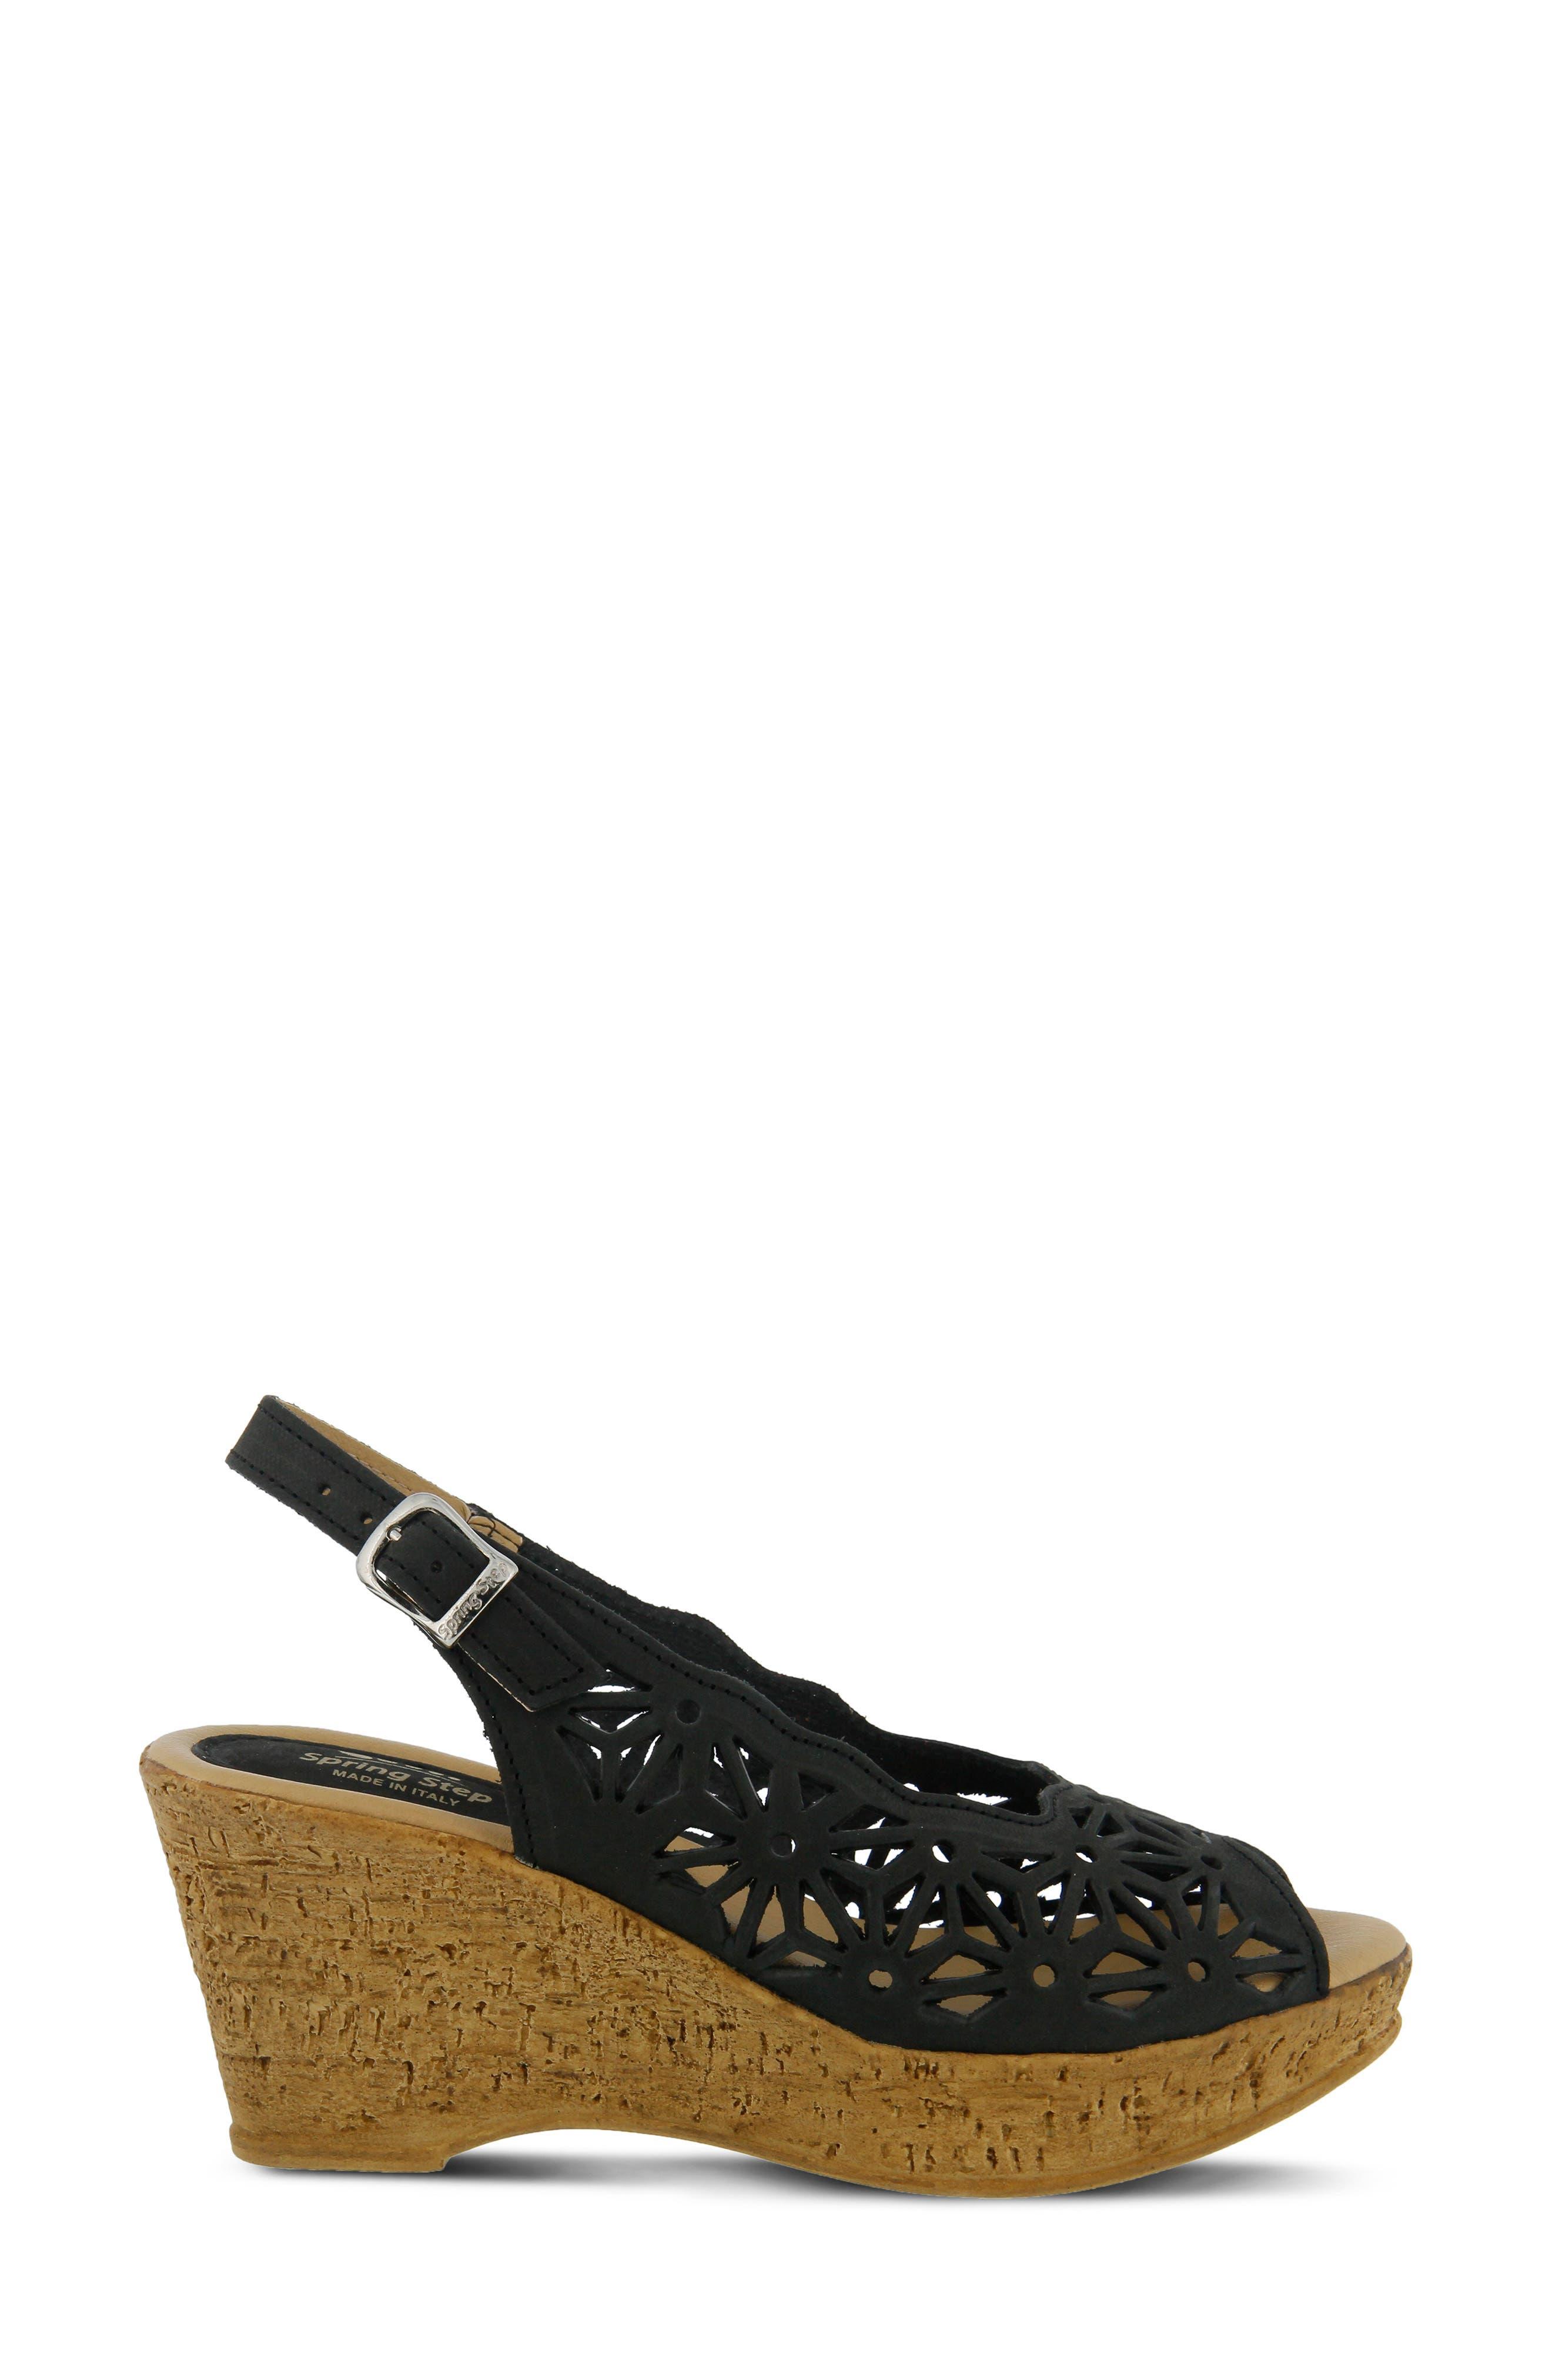 SPRING STEP,                             Abigail Platform Wedge Sandal,                             Alternate thumbnail 2, color,                             BLACK LEATHER